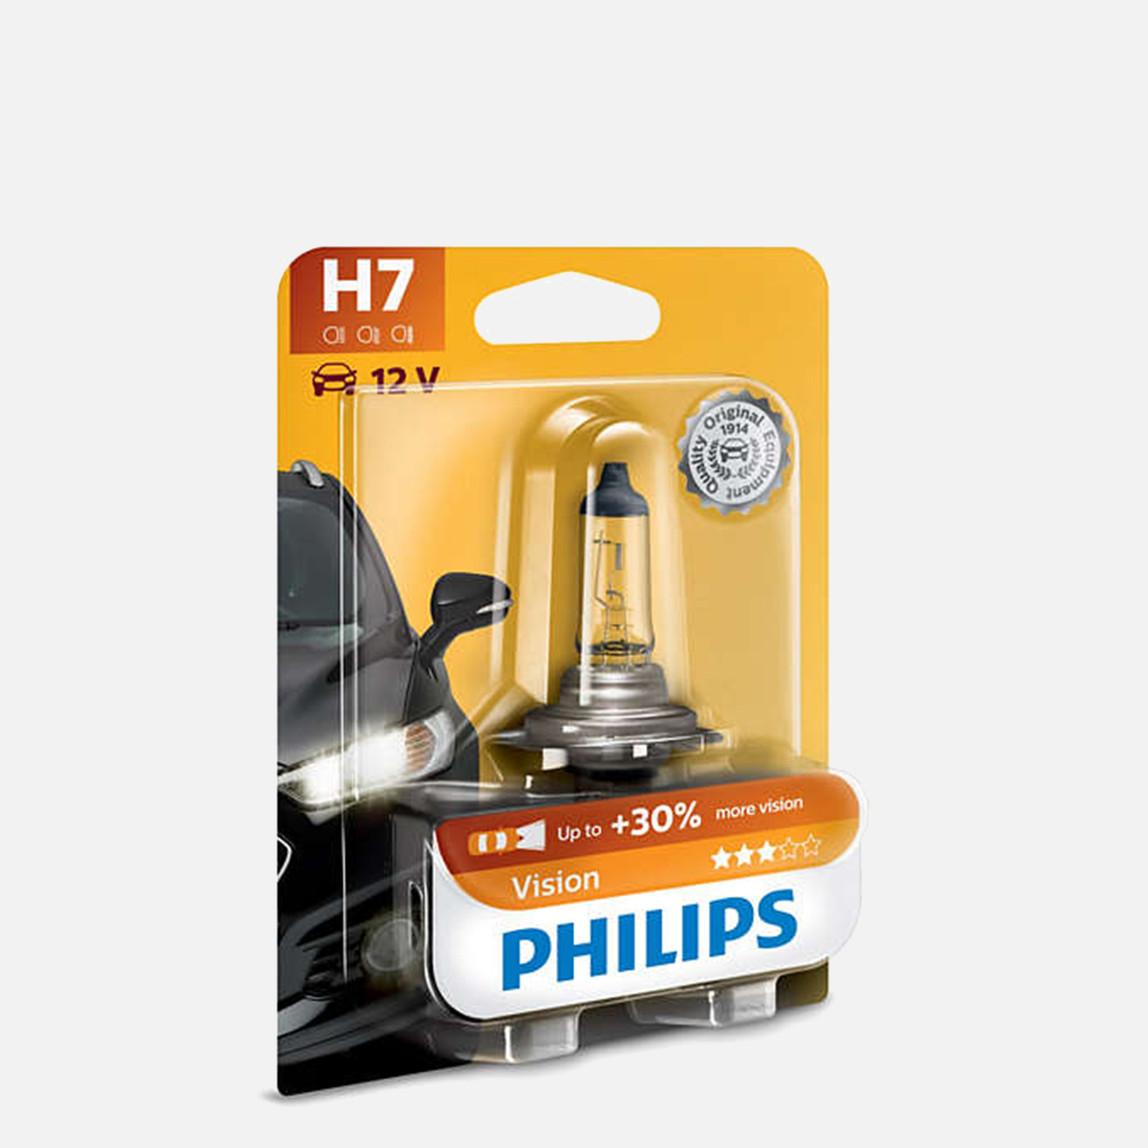 Philips H7 Vision H4 12V 55W Halogen Oto ampul